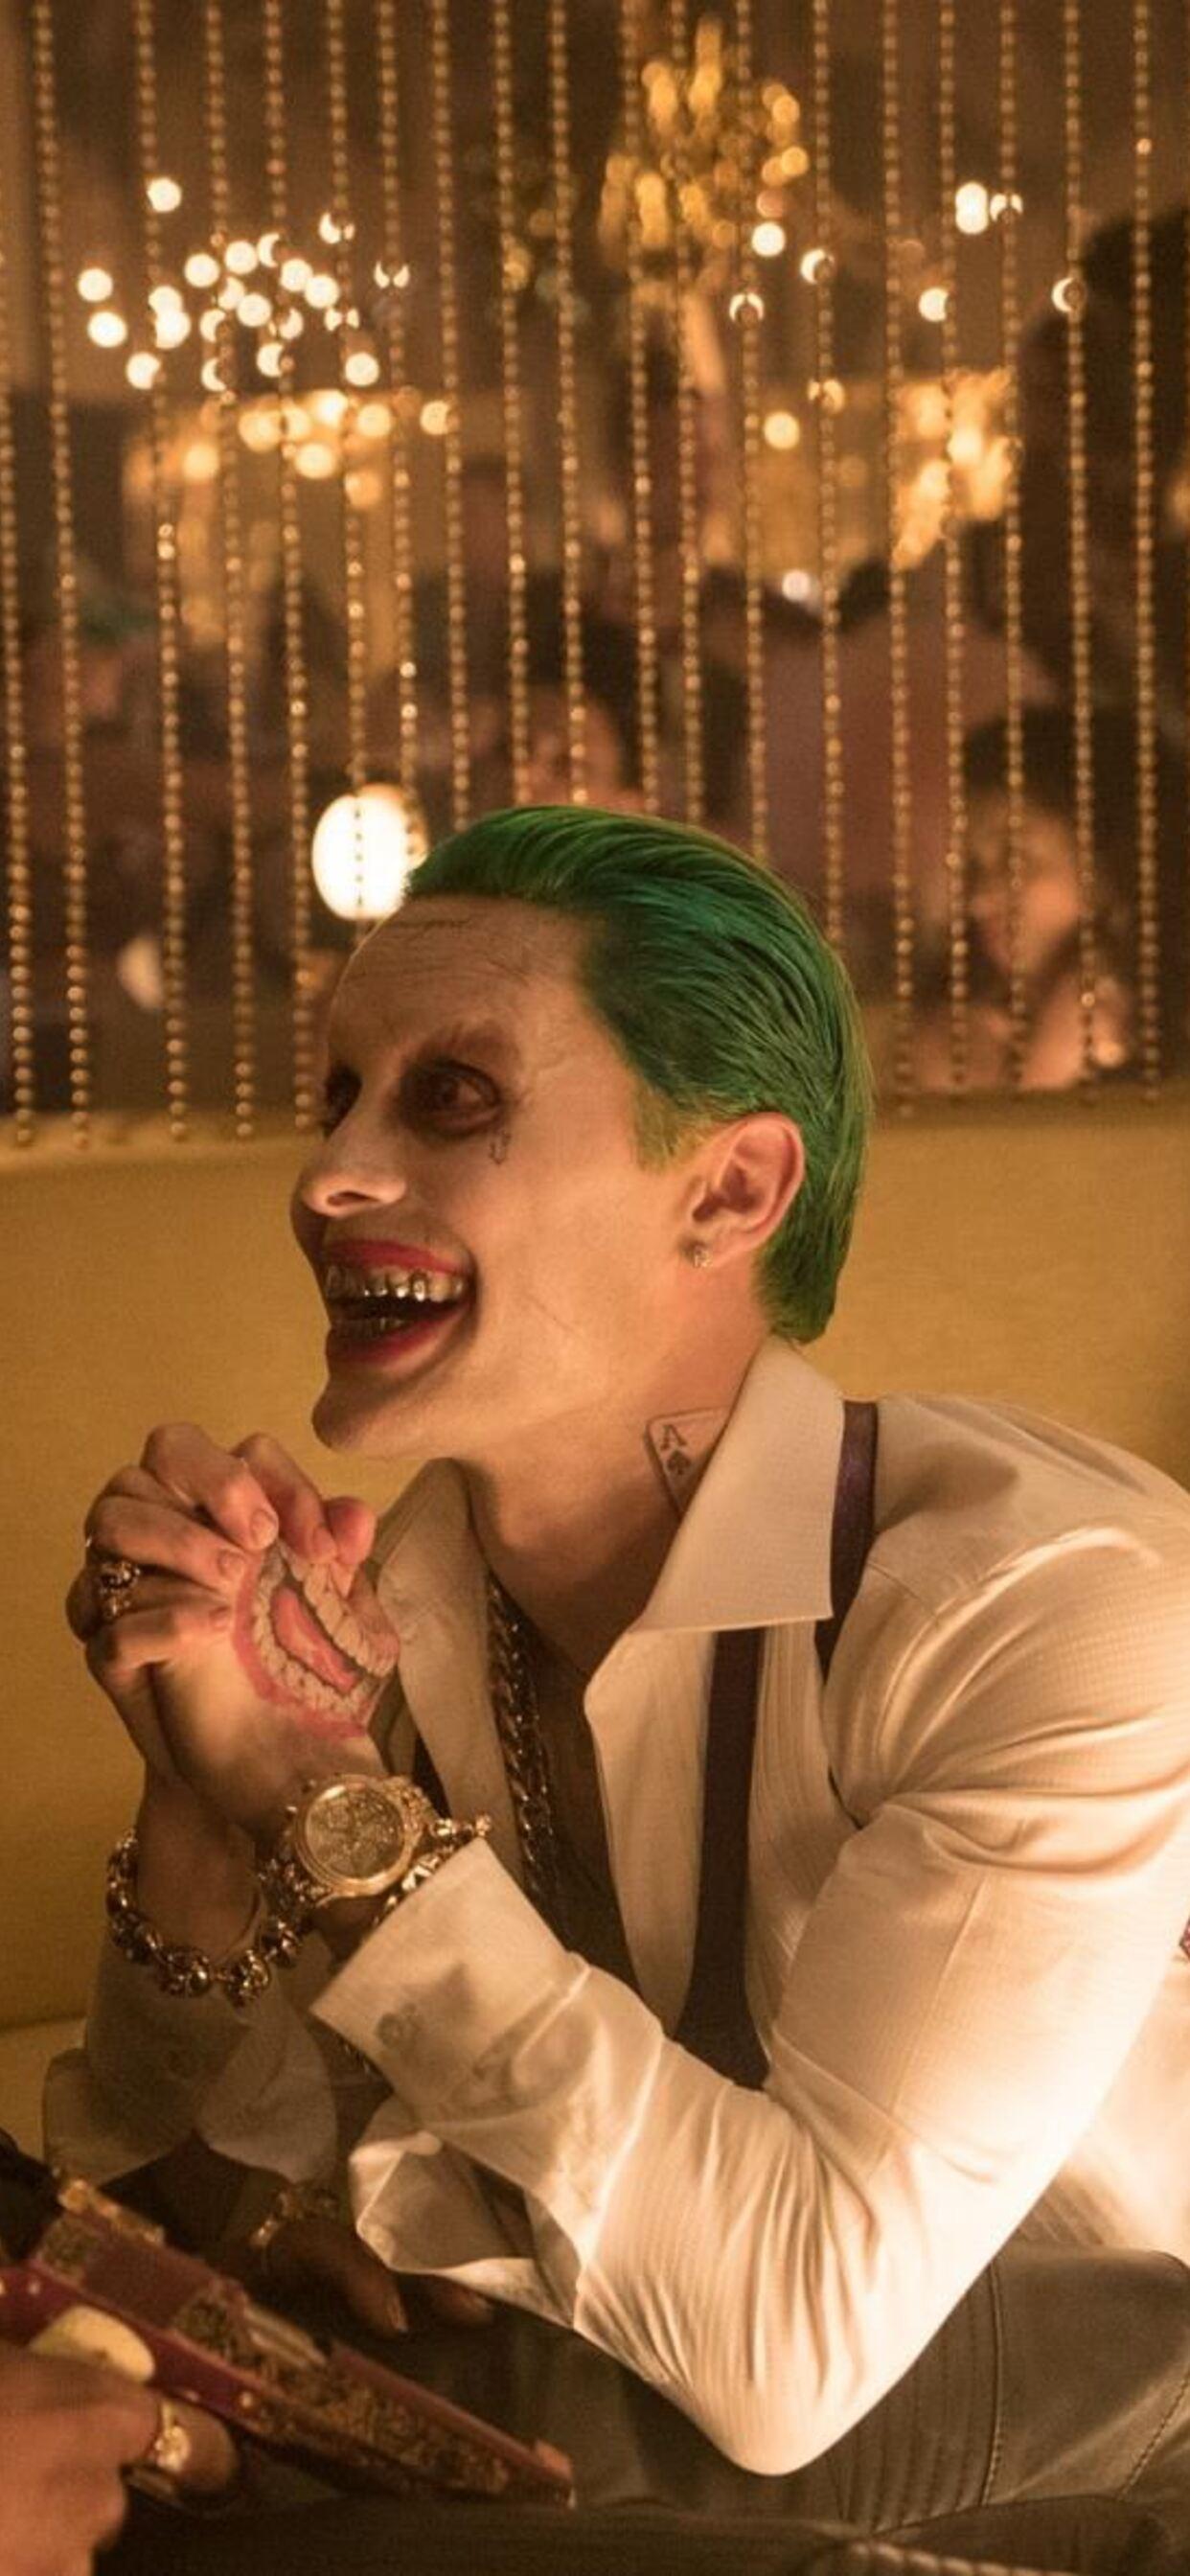 1242x2688 Joker Harley Quinn Suicide Squad Iphone Xs Max Hd 4k